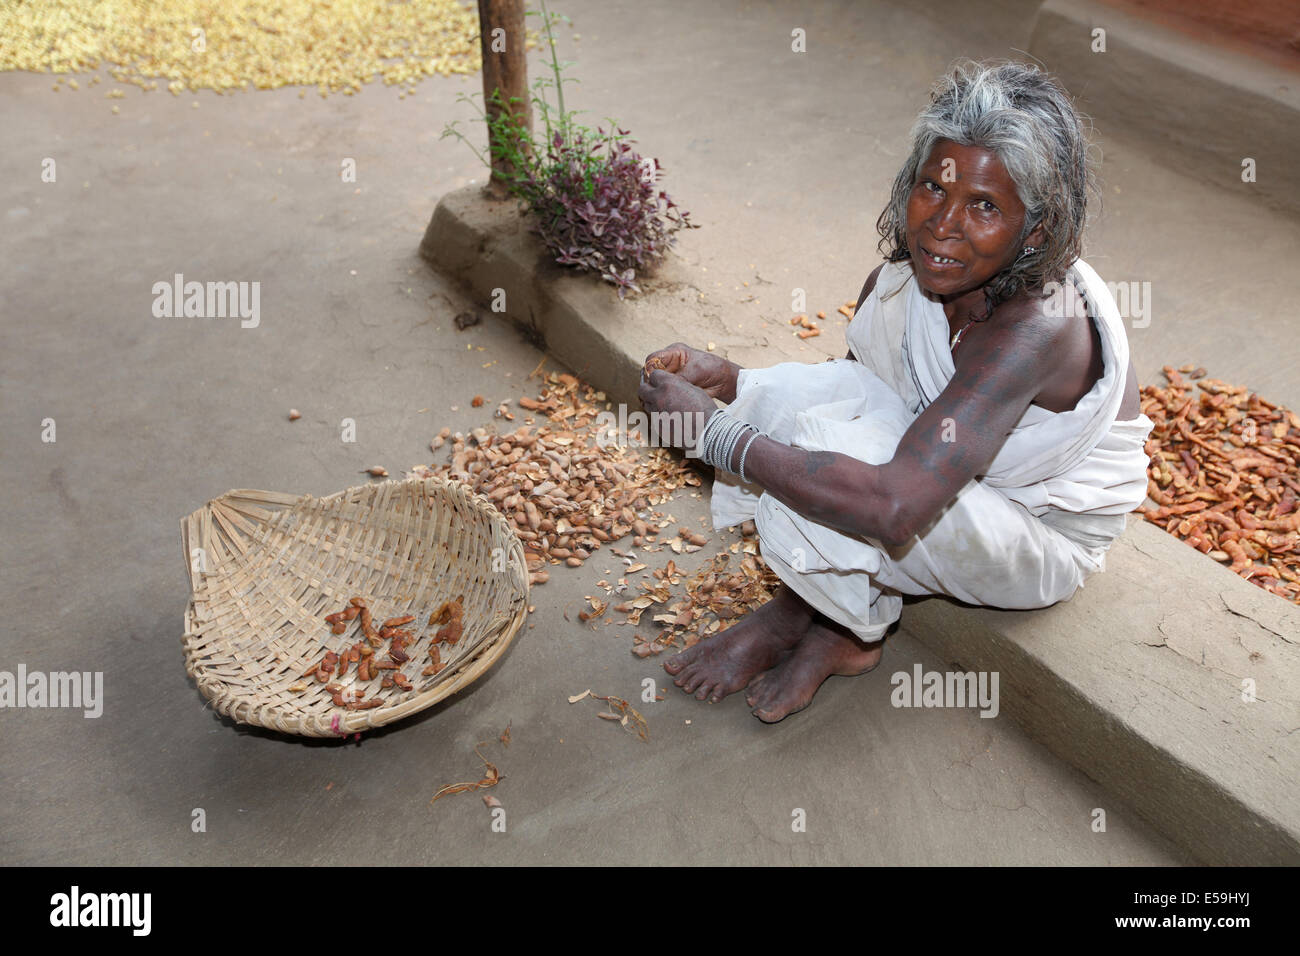 Old woman peeling tamarind, Bhunjia tribe, Kodopali Village, Chattisgadh, India - Stock Image